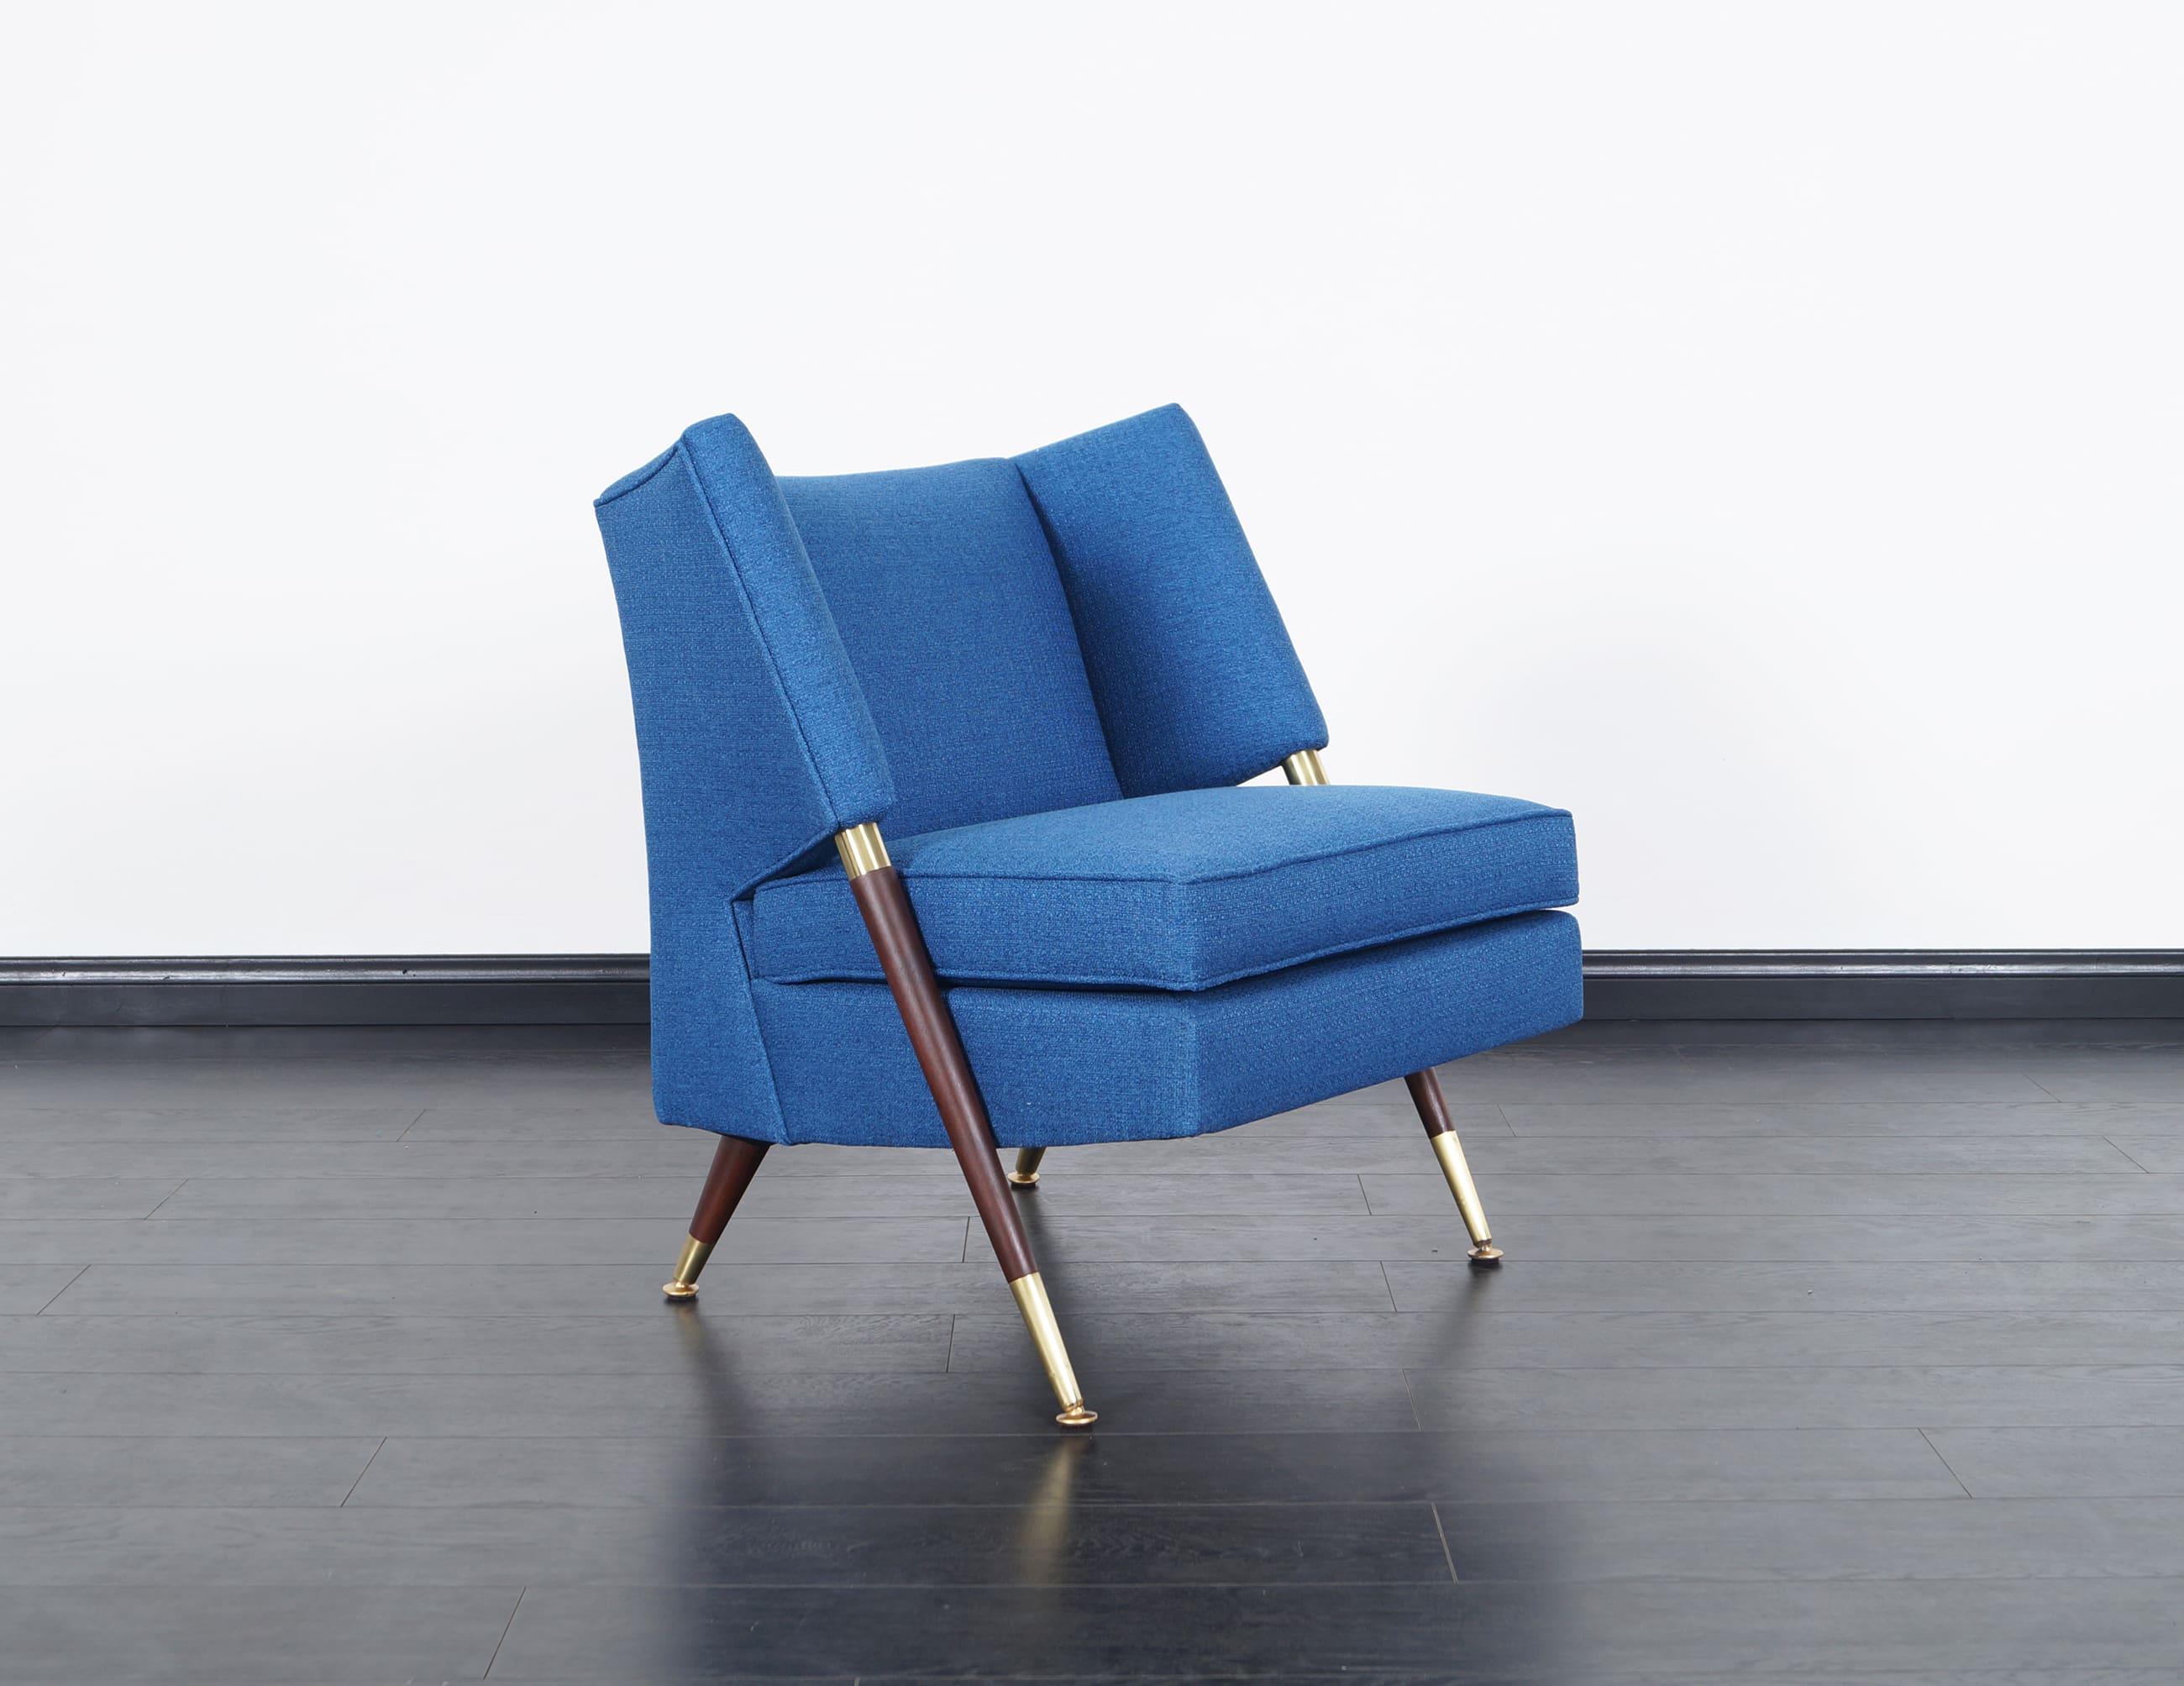 Modernist Walnut & Brass Lounge Chairs